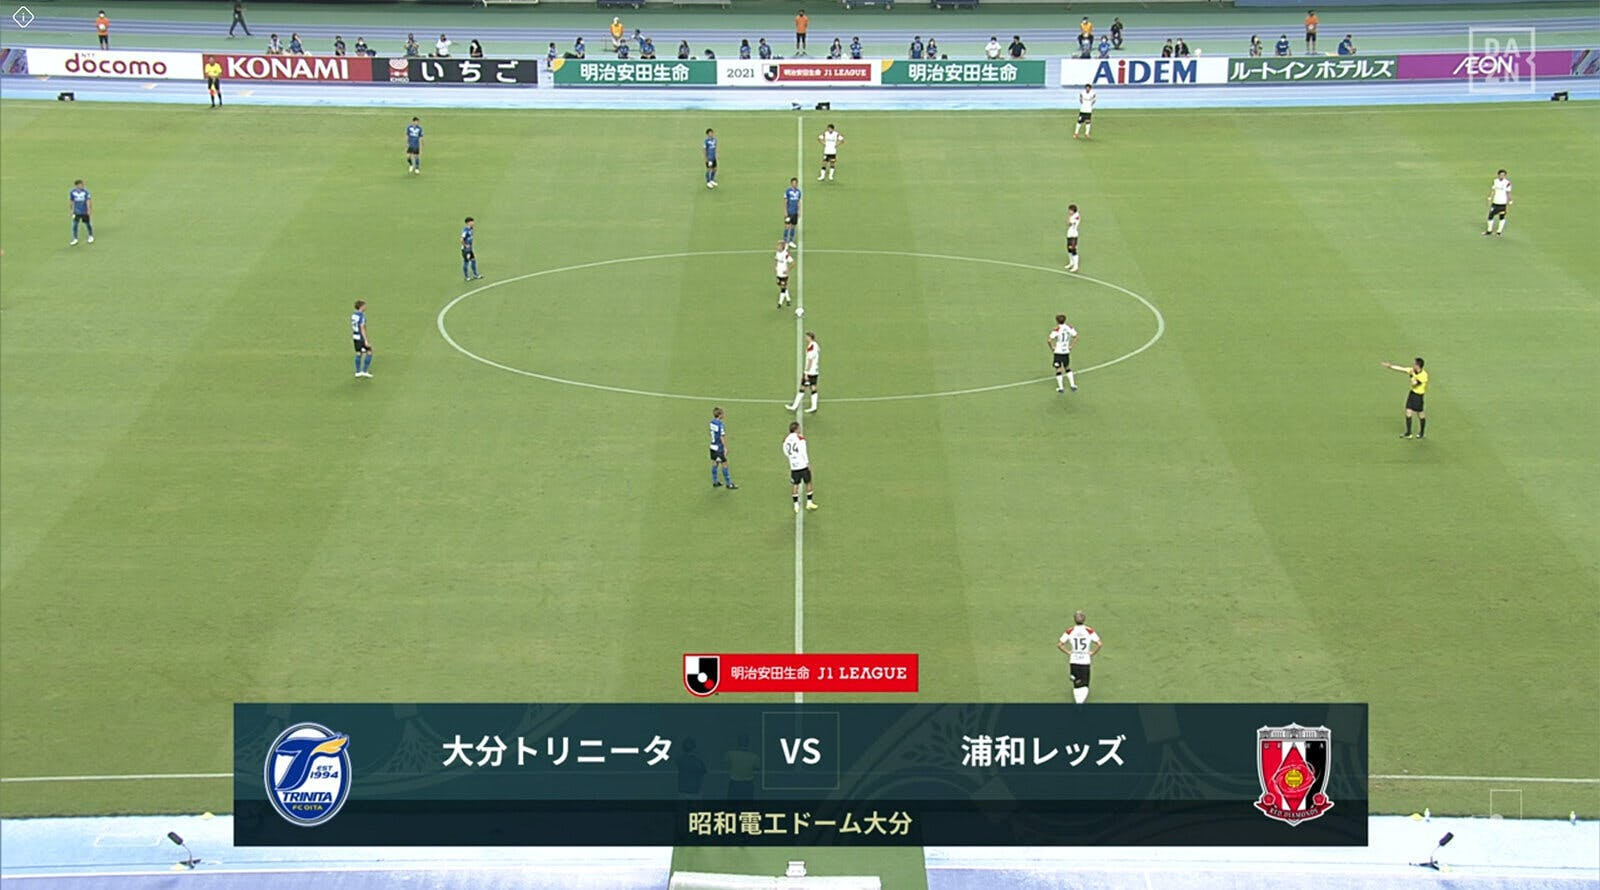 2021 Jリーグ 第22節 昭和電工ドーム大分 アウェー 大分トリニータ戦